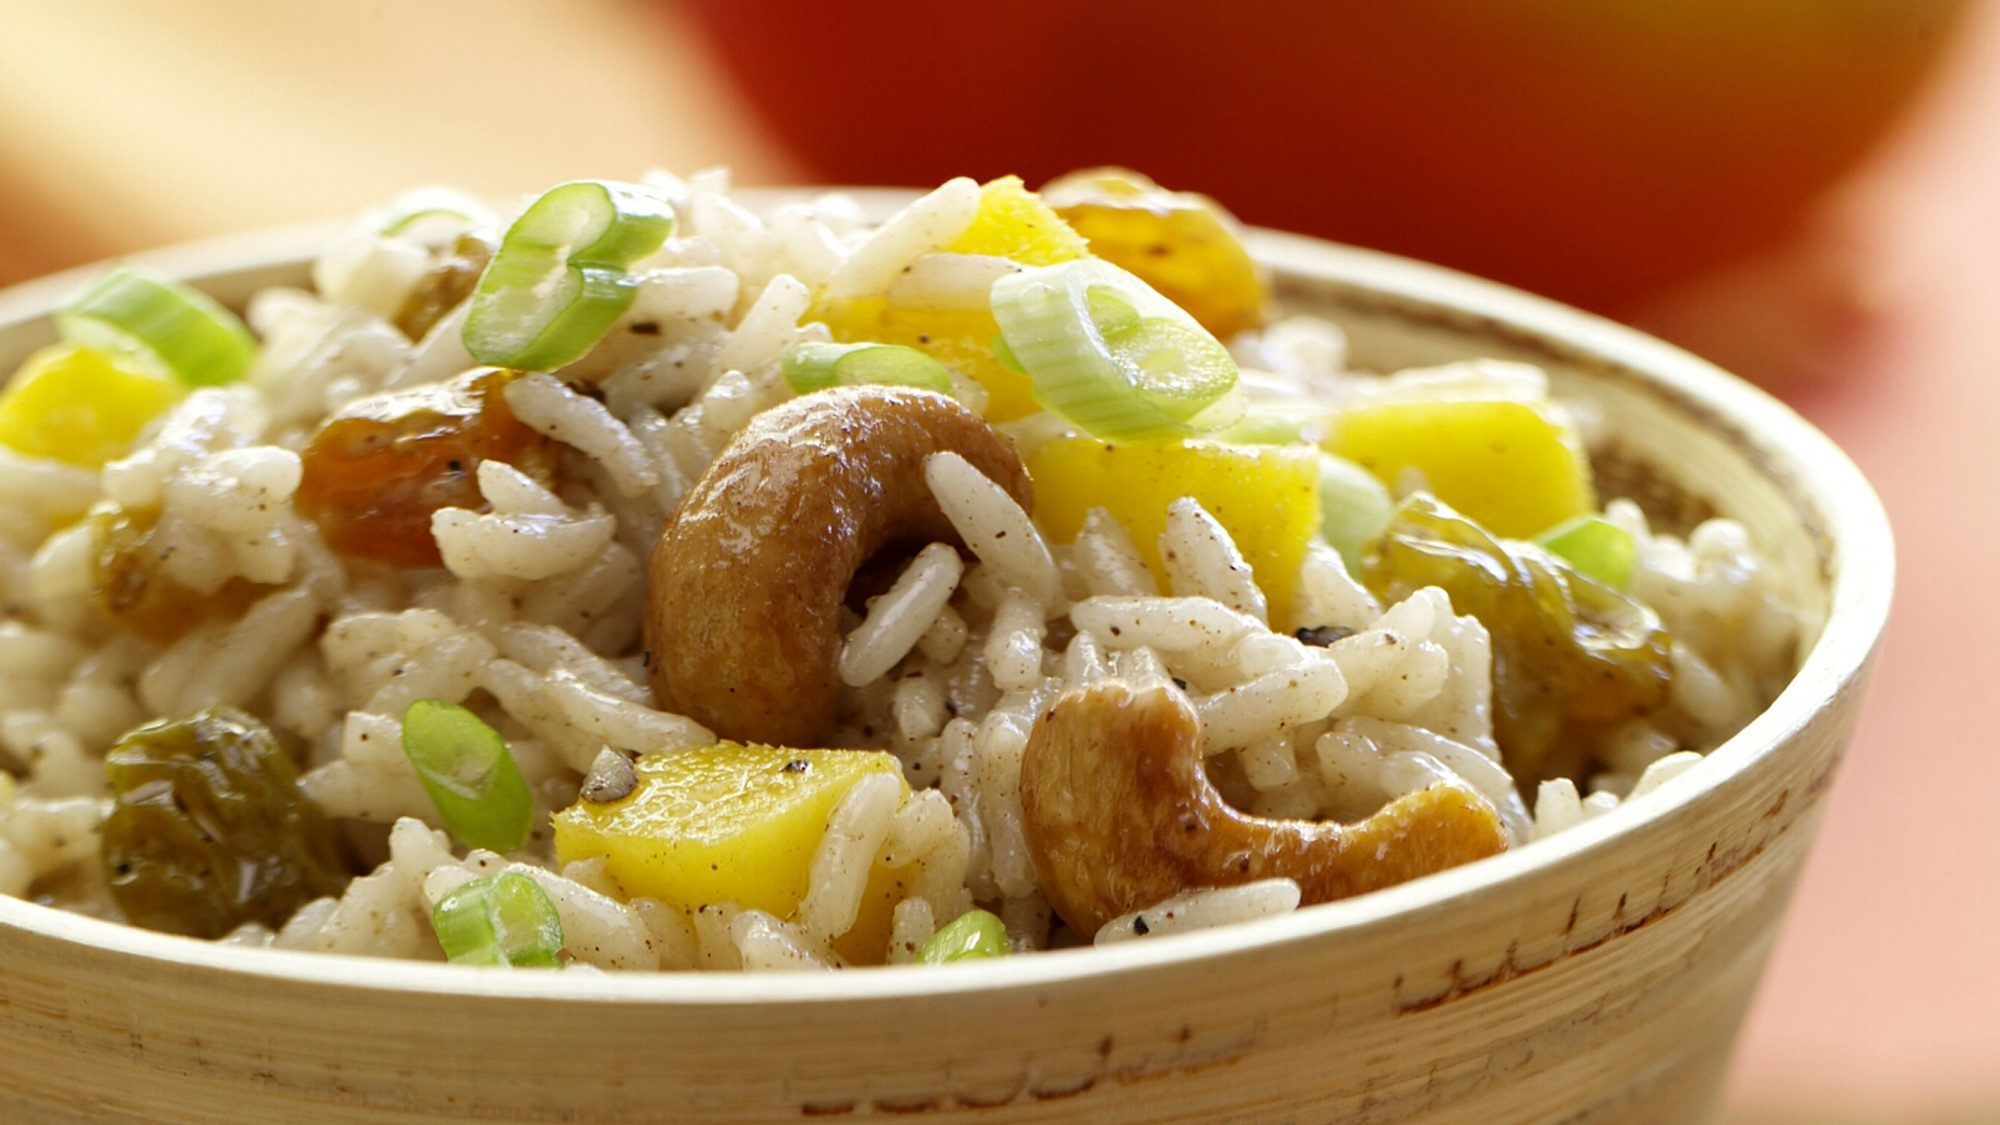 McCormick Spiced Basmati Rice